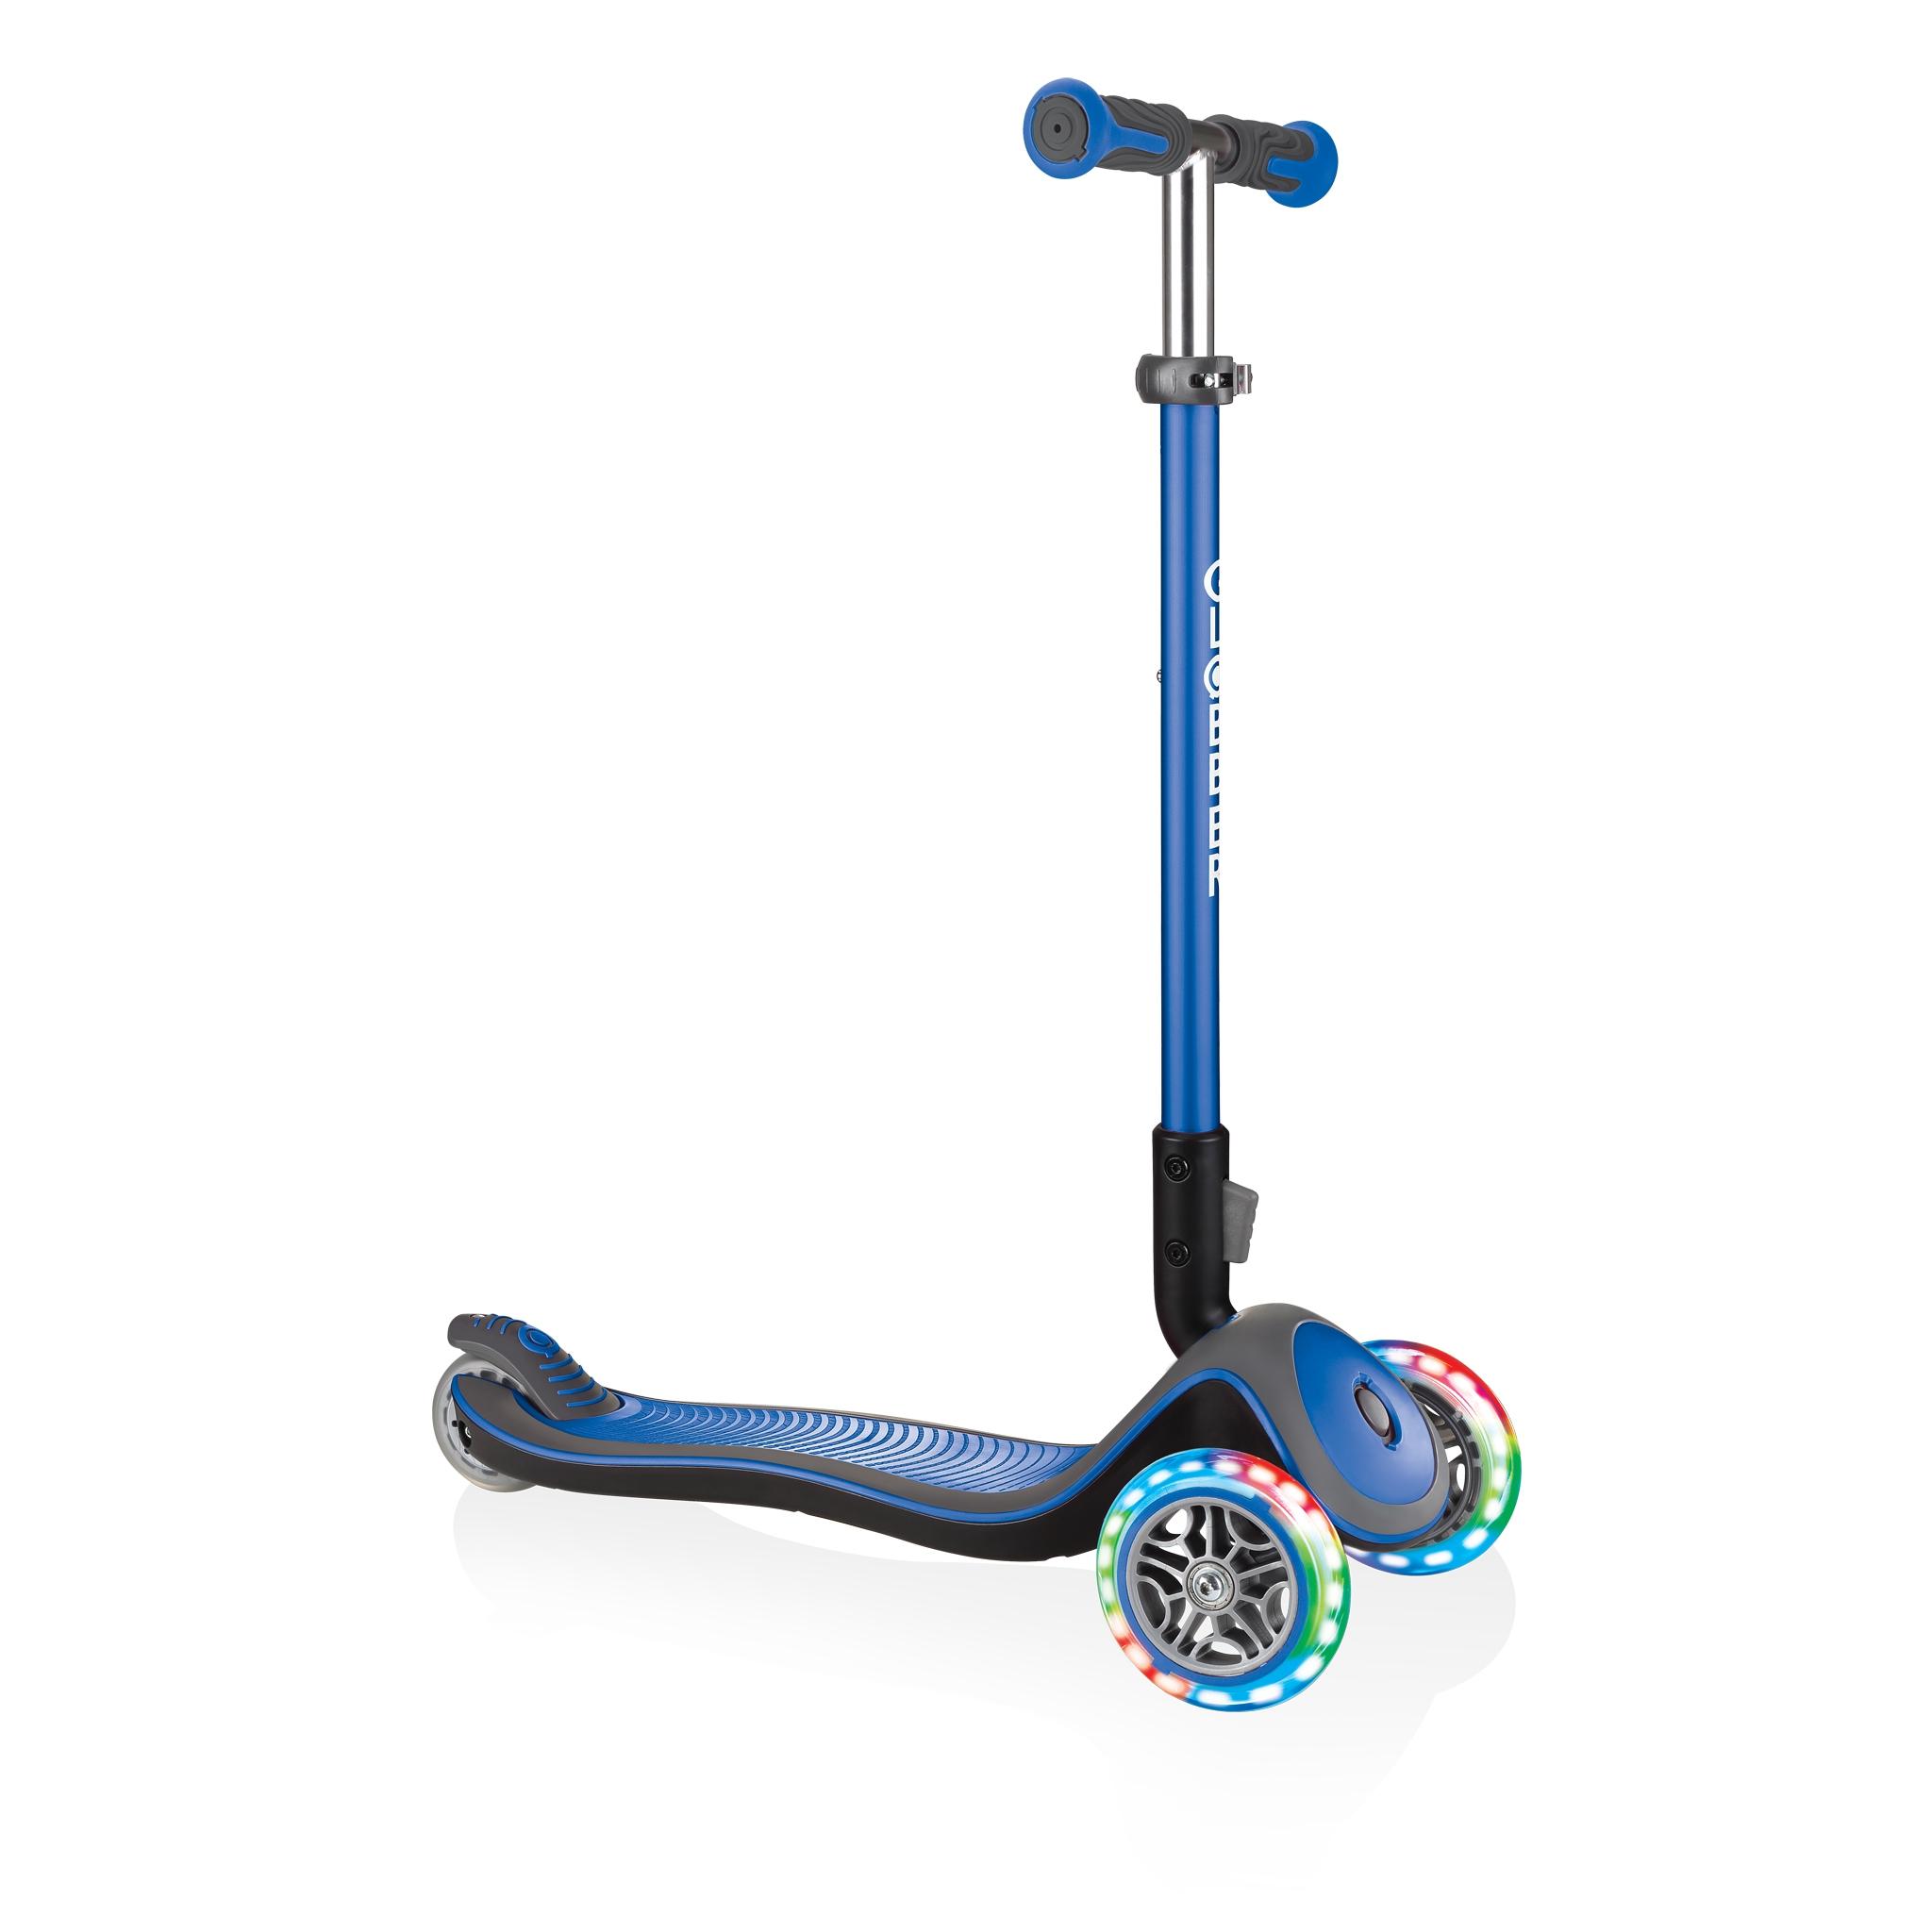 Globber-ELITE-DELUXE-LIGHTS-Best-3-wheel-light-up-scooter-for-kids-aged-3+-navy-blue 0